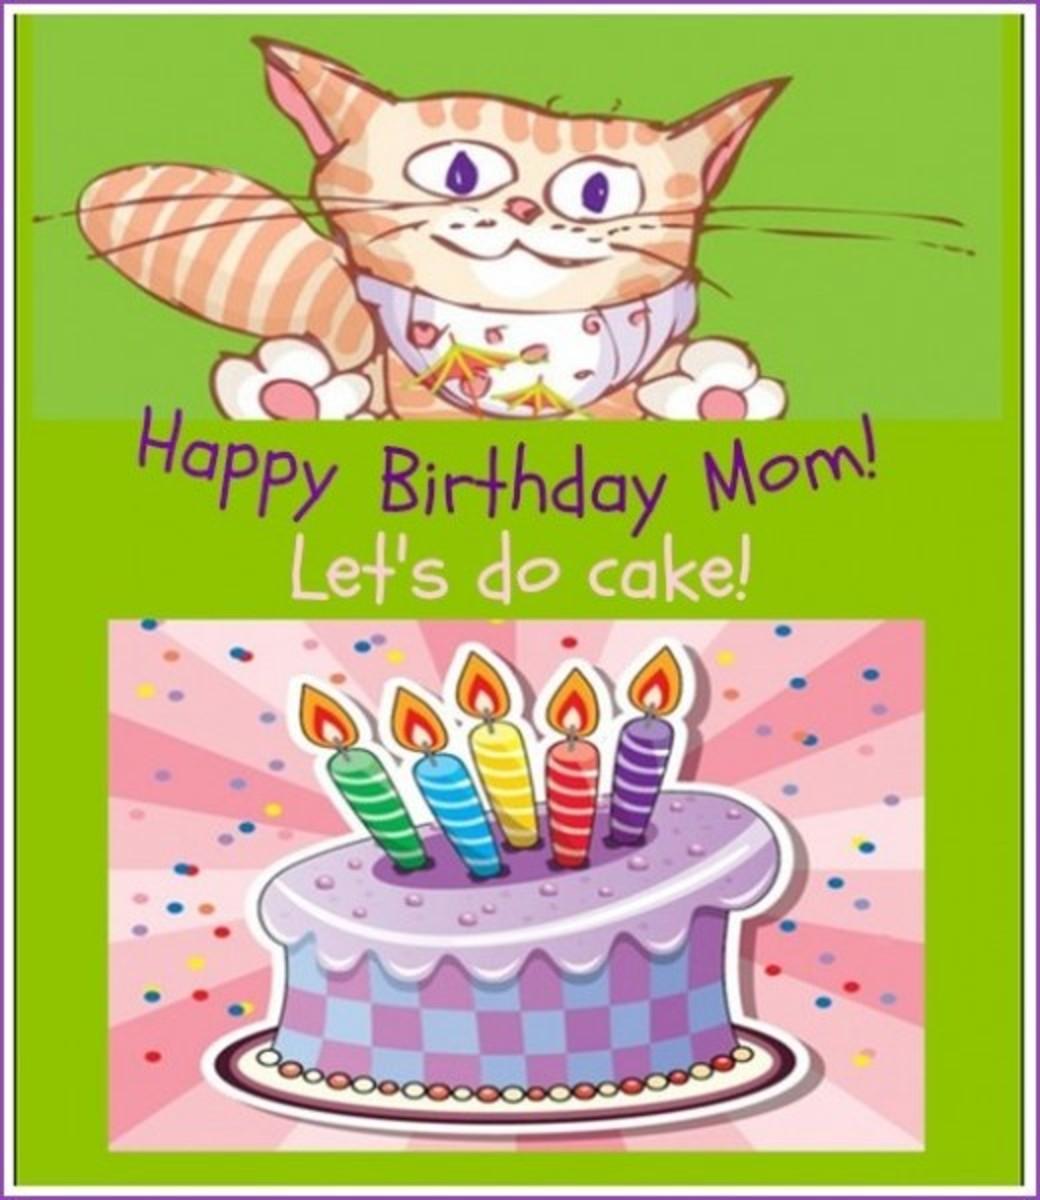 LOL Cat Mother Birthday Quote